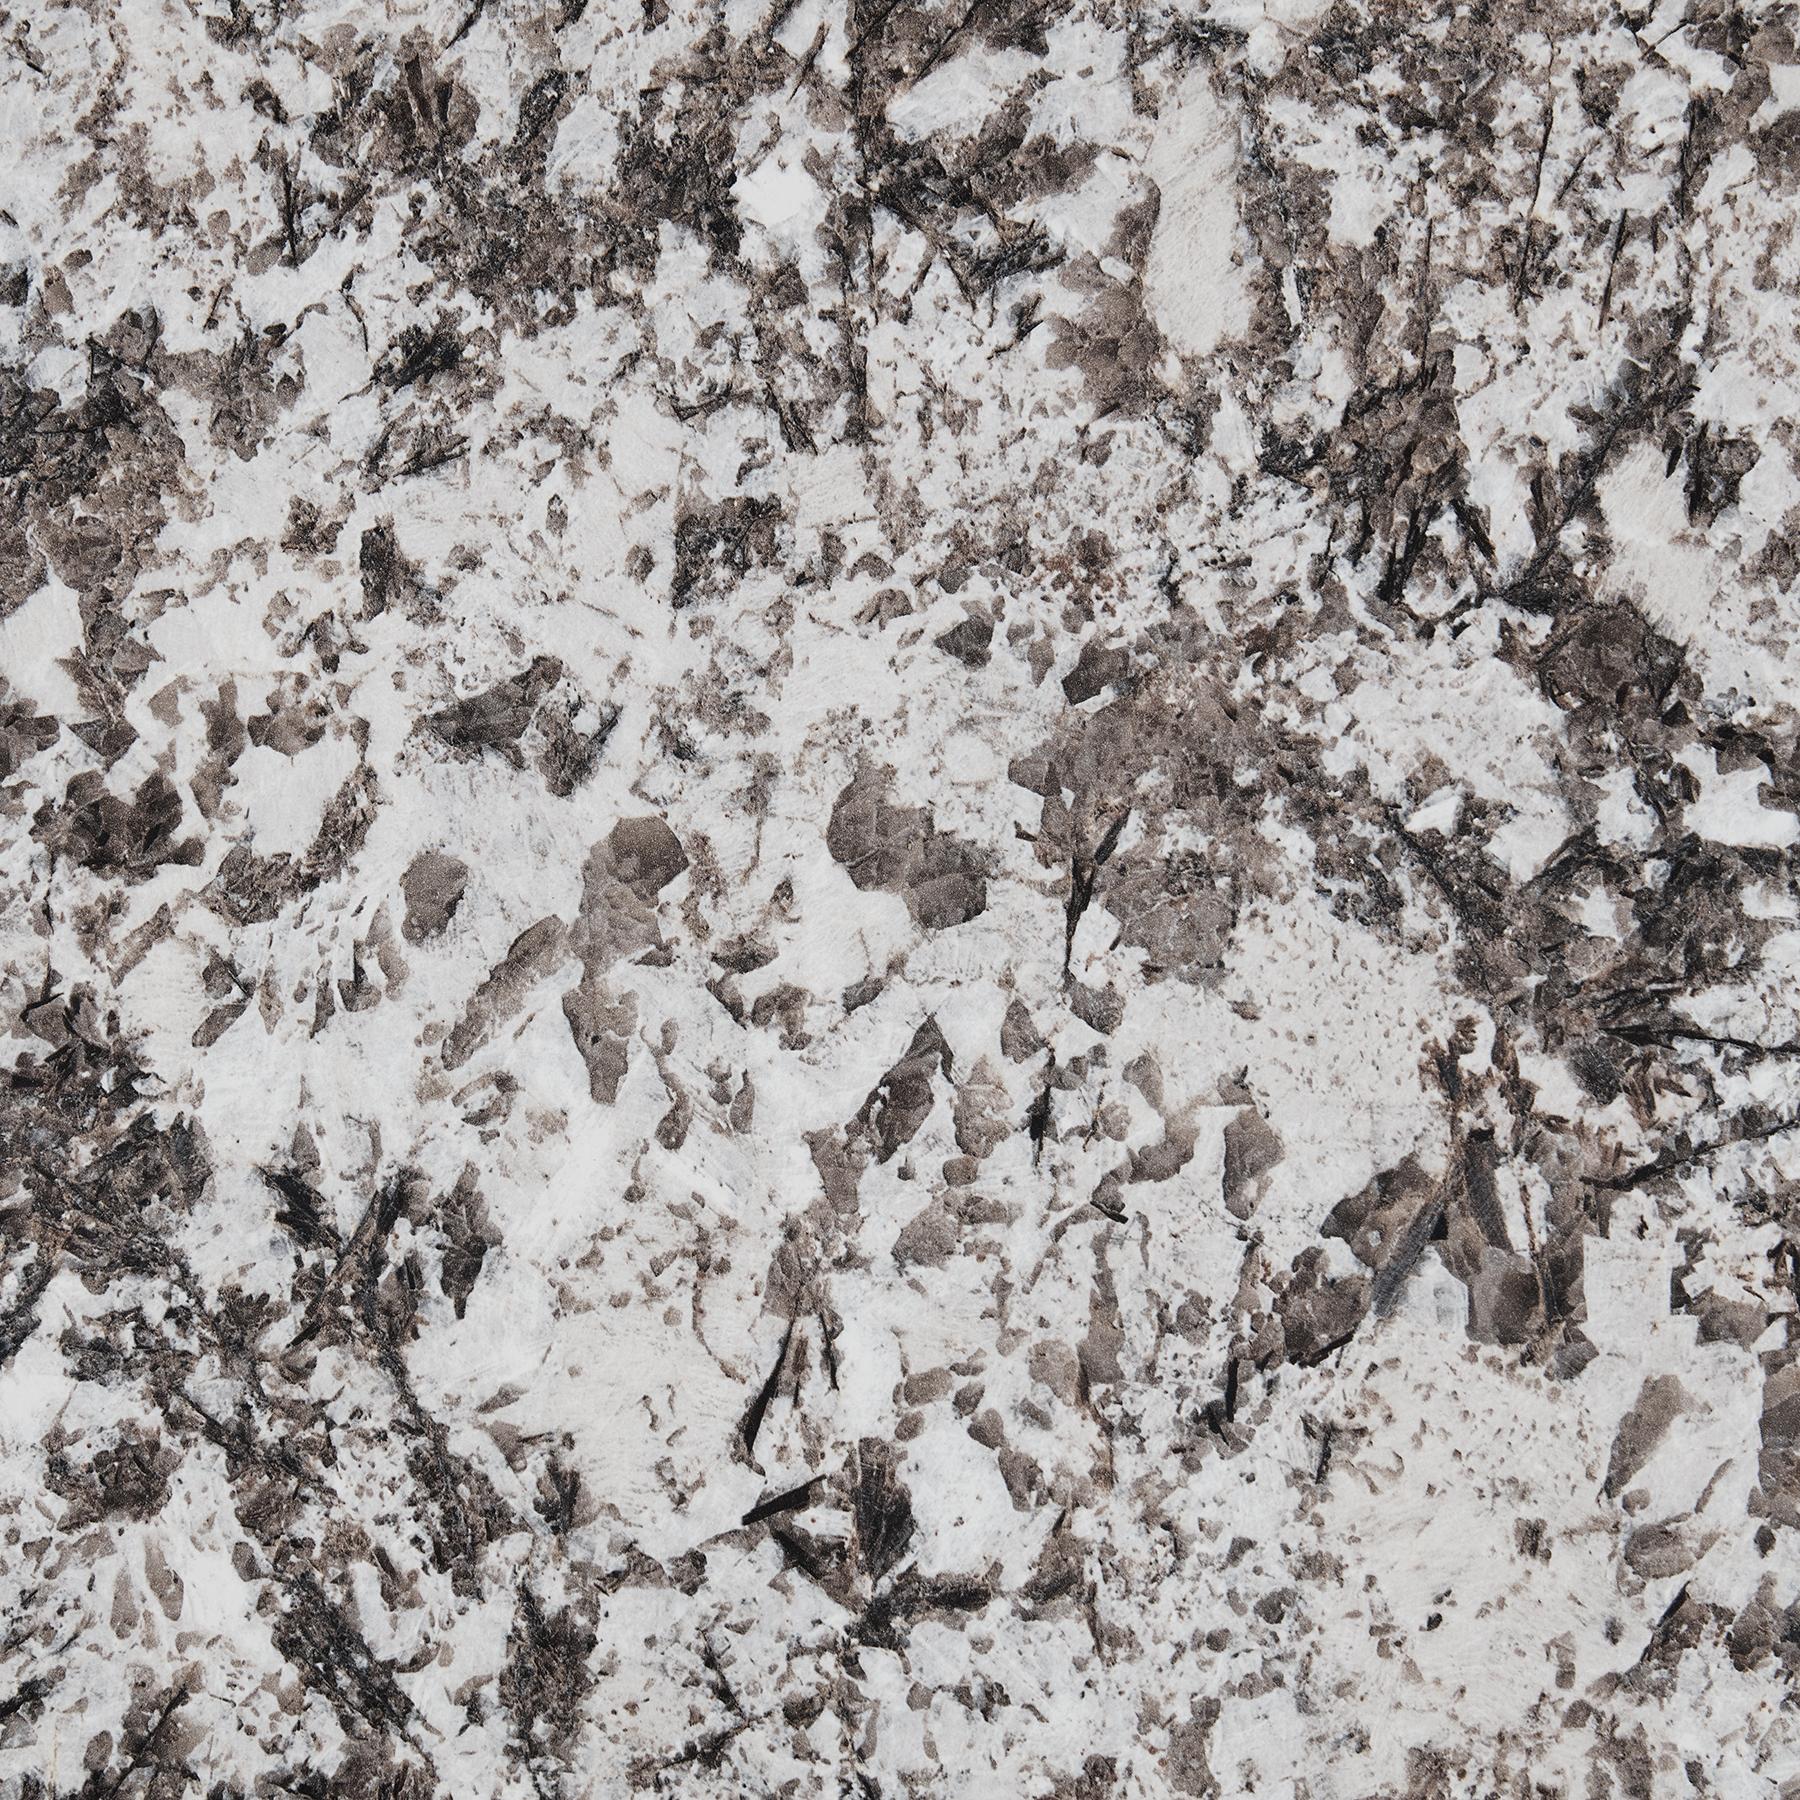 06001 Bianco Antico Swatch